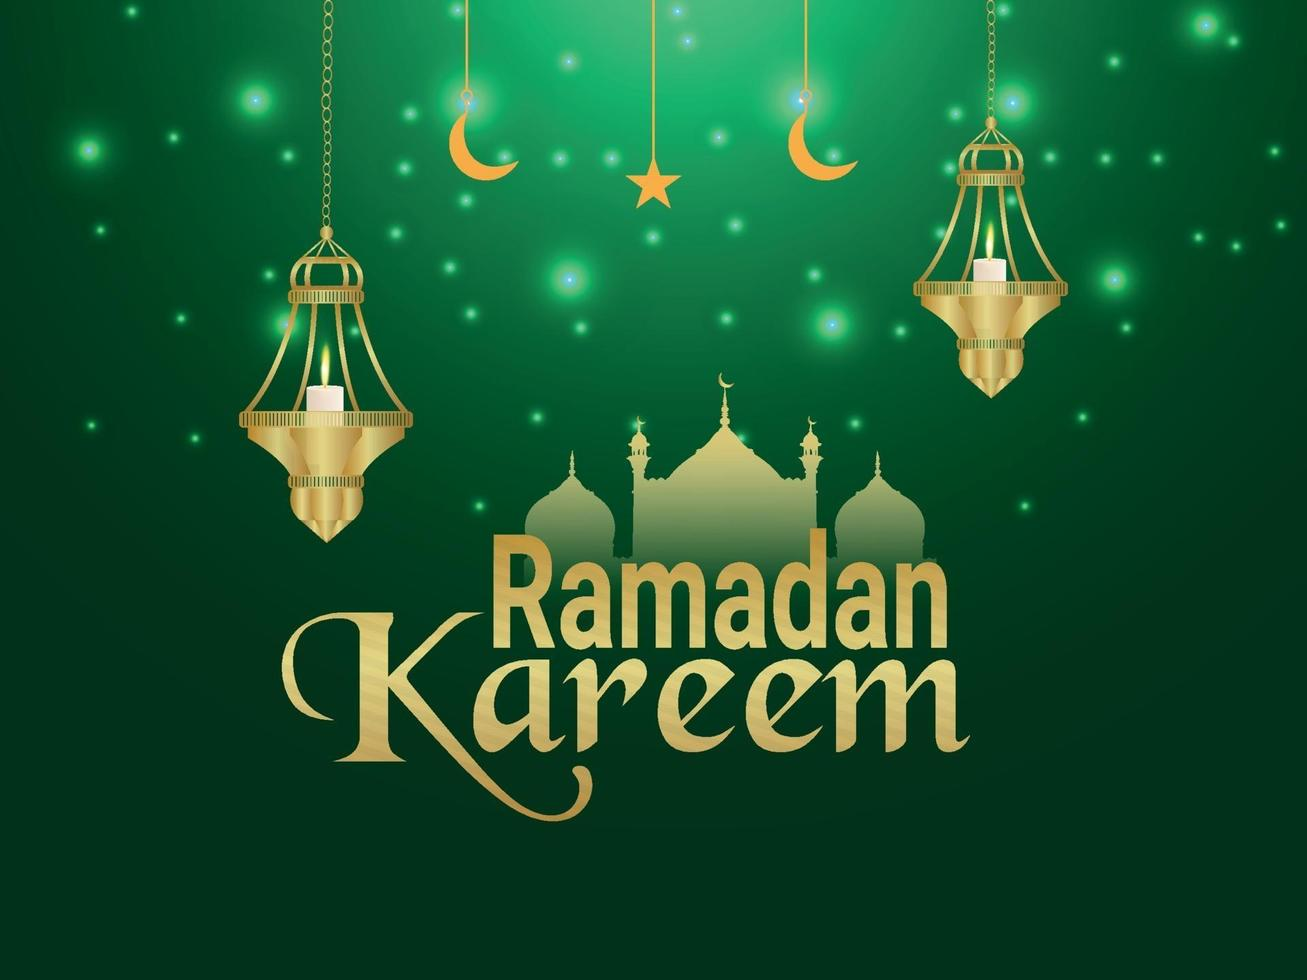 ramadan kareem islamisk festival med gyllene lyktor och månen på kreativ bakgrund vektor